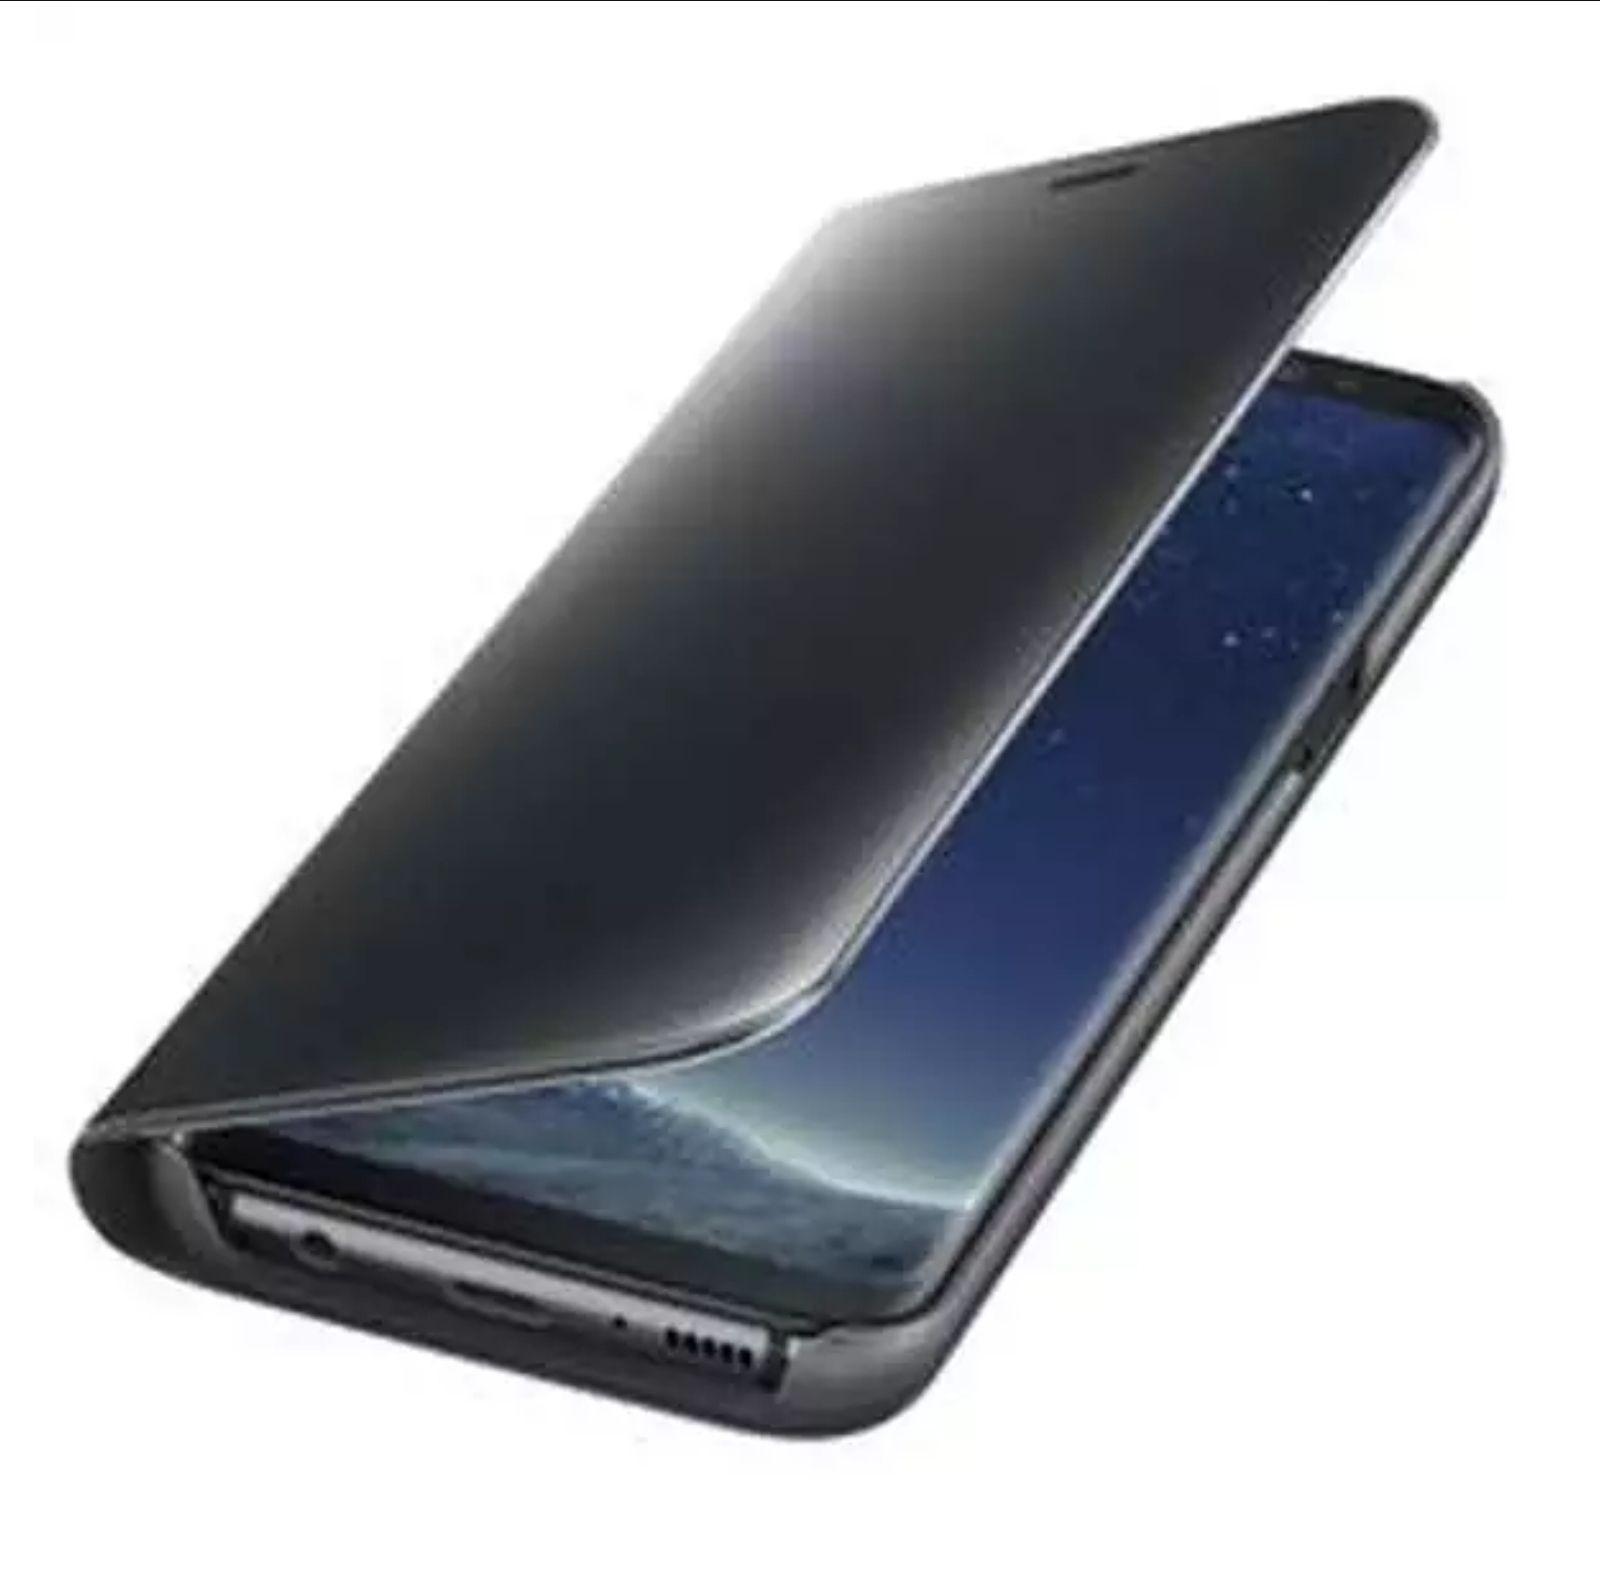 Original Samsung Galaxy S8 Clear View Cover EF-ZG950 Black